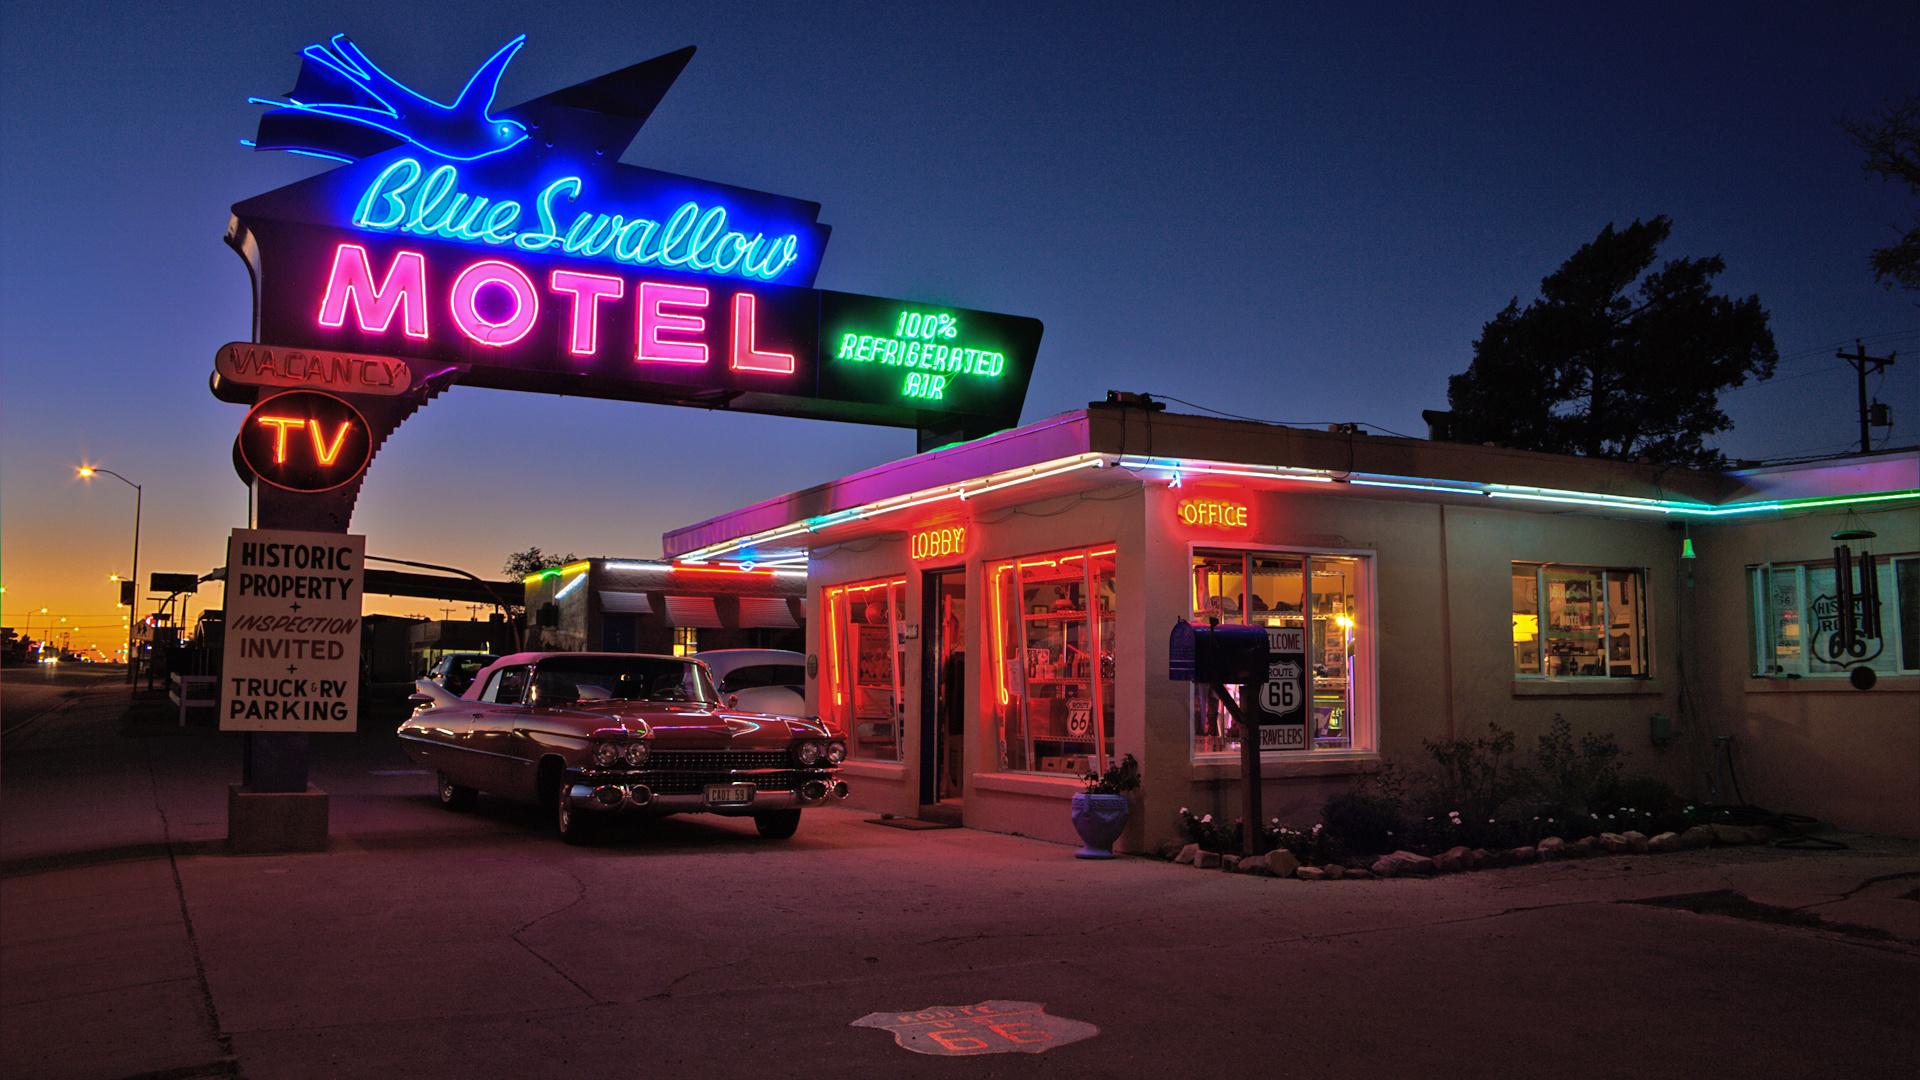 Classic Motel Blue Swallow Motel Route 66 By Night Foto Amp Bild